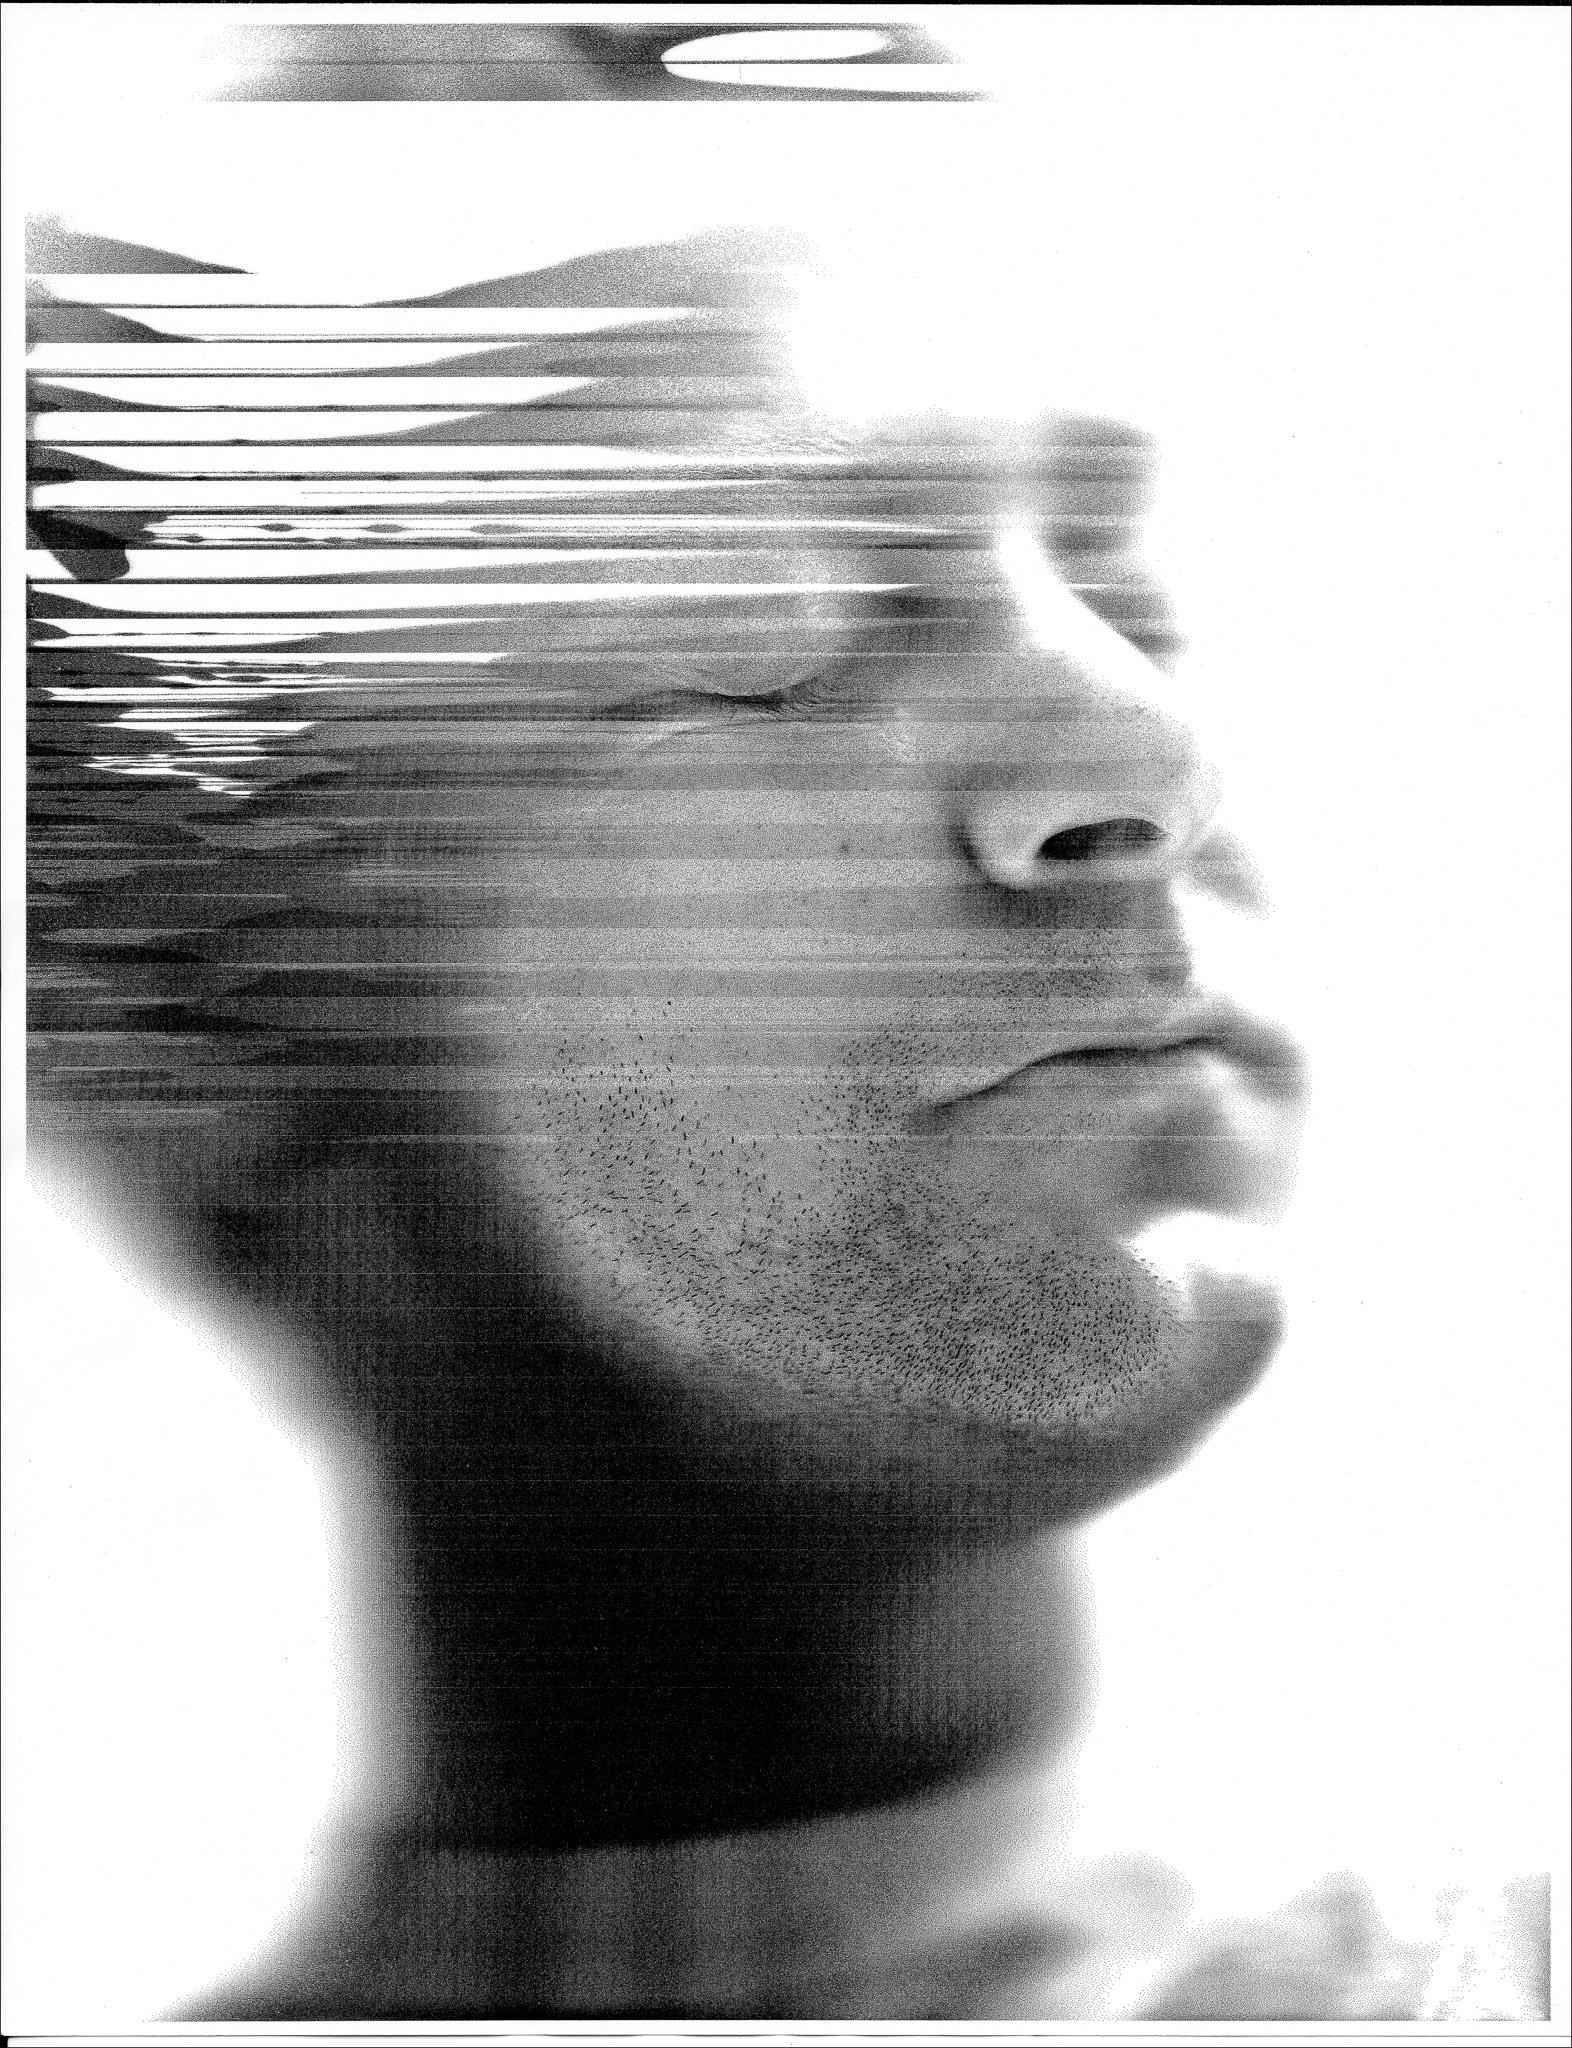 140810_Self_Portrait_Fax_Machine.jpg